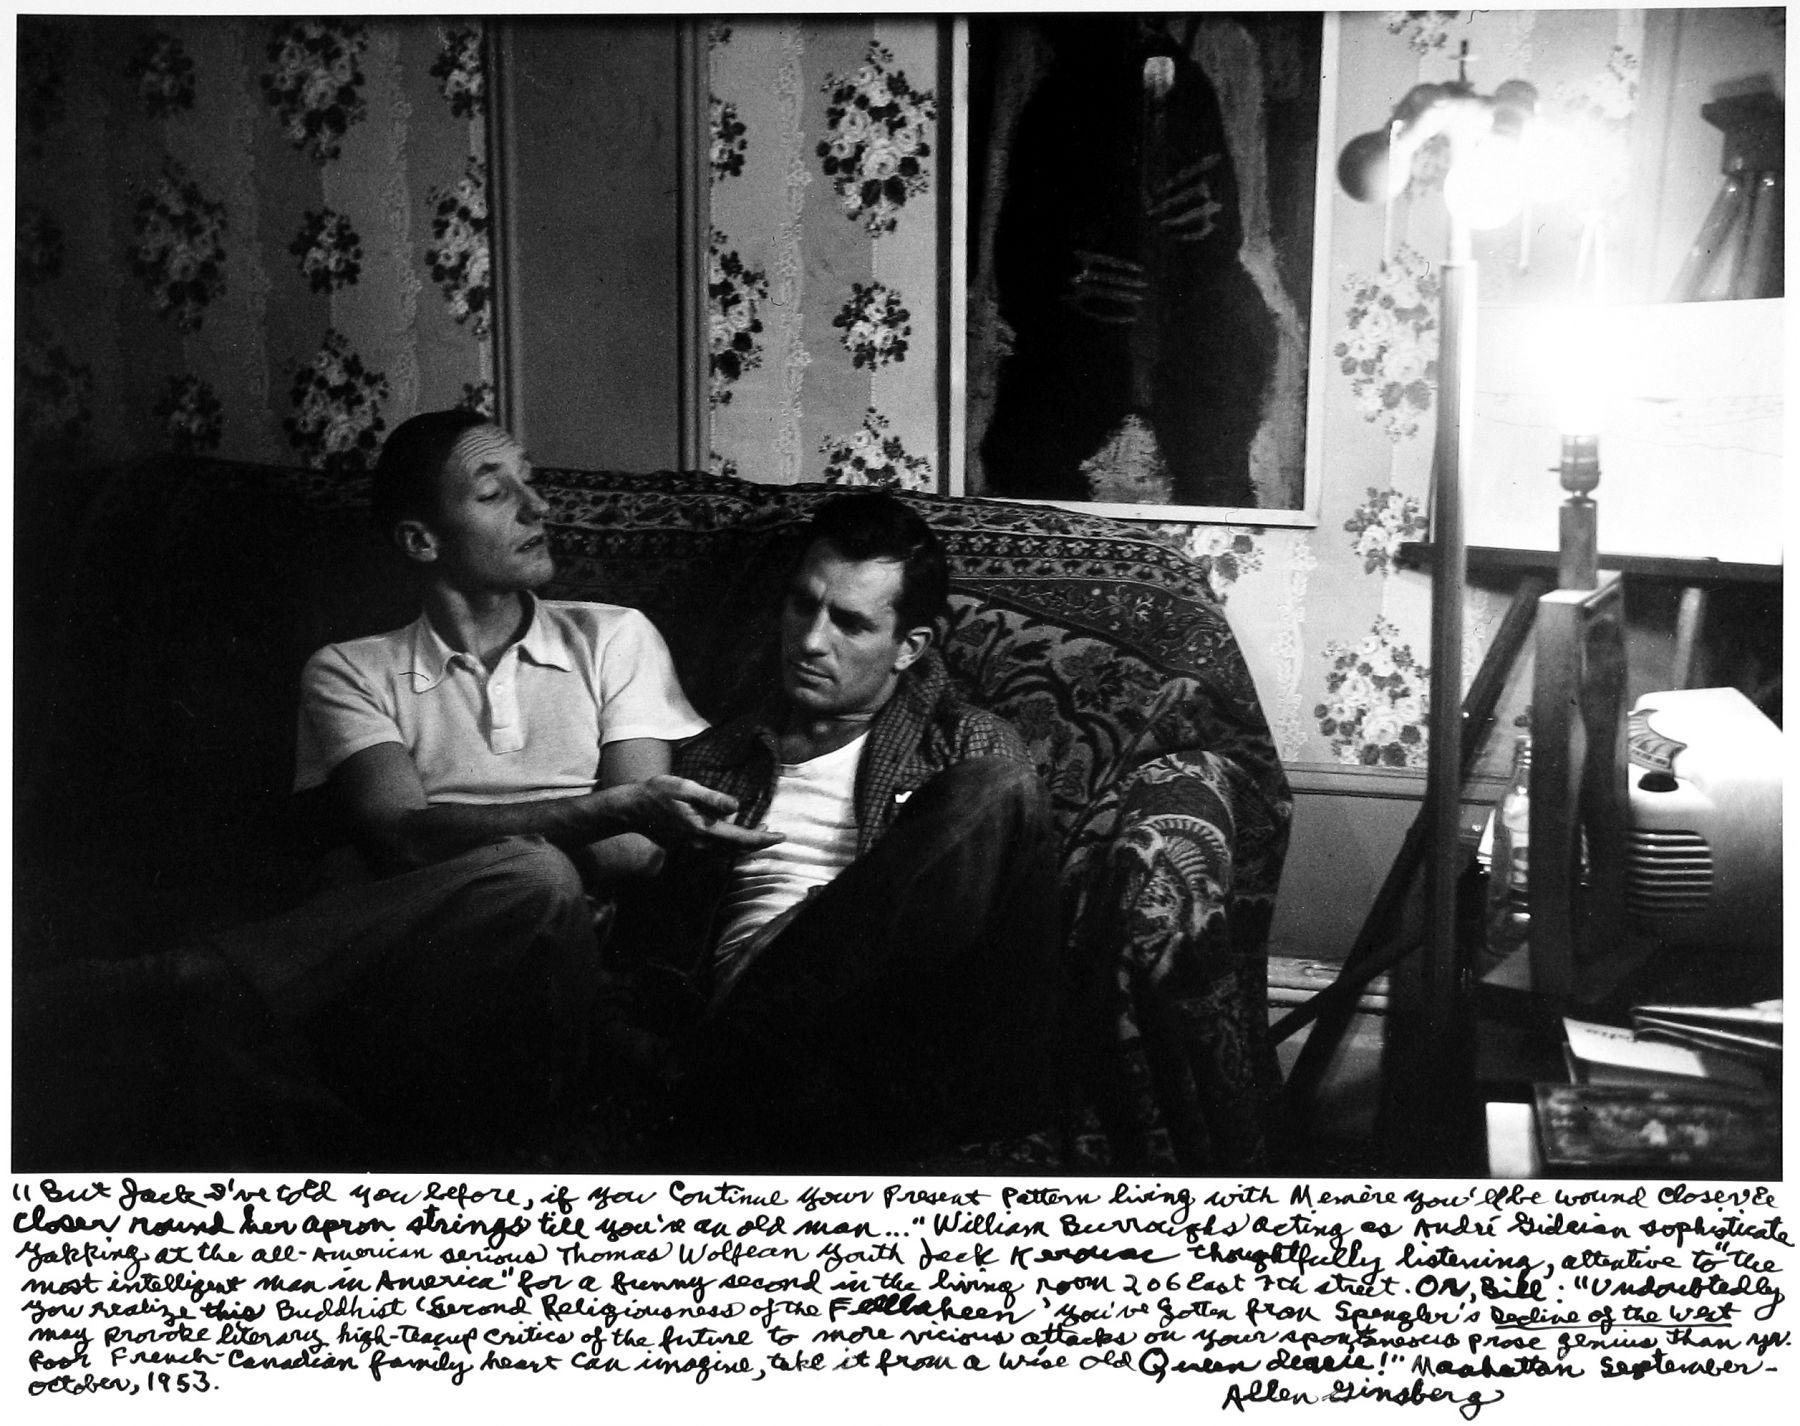 Allen Ginsberg - William S. Burroughs & Jack Karouac, New York, 1953 - Howard Greenberg Gallery